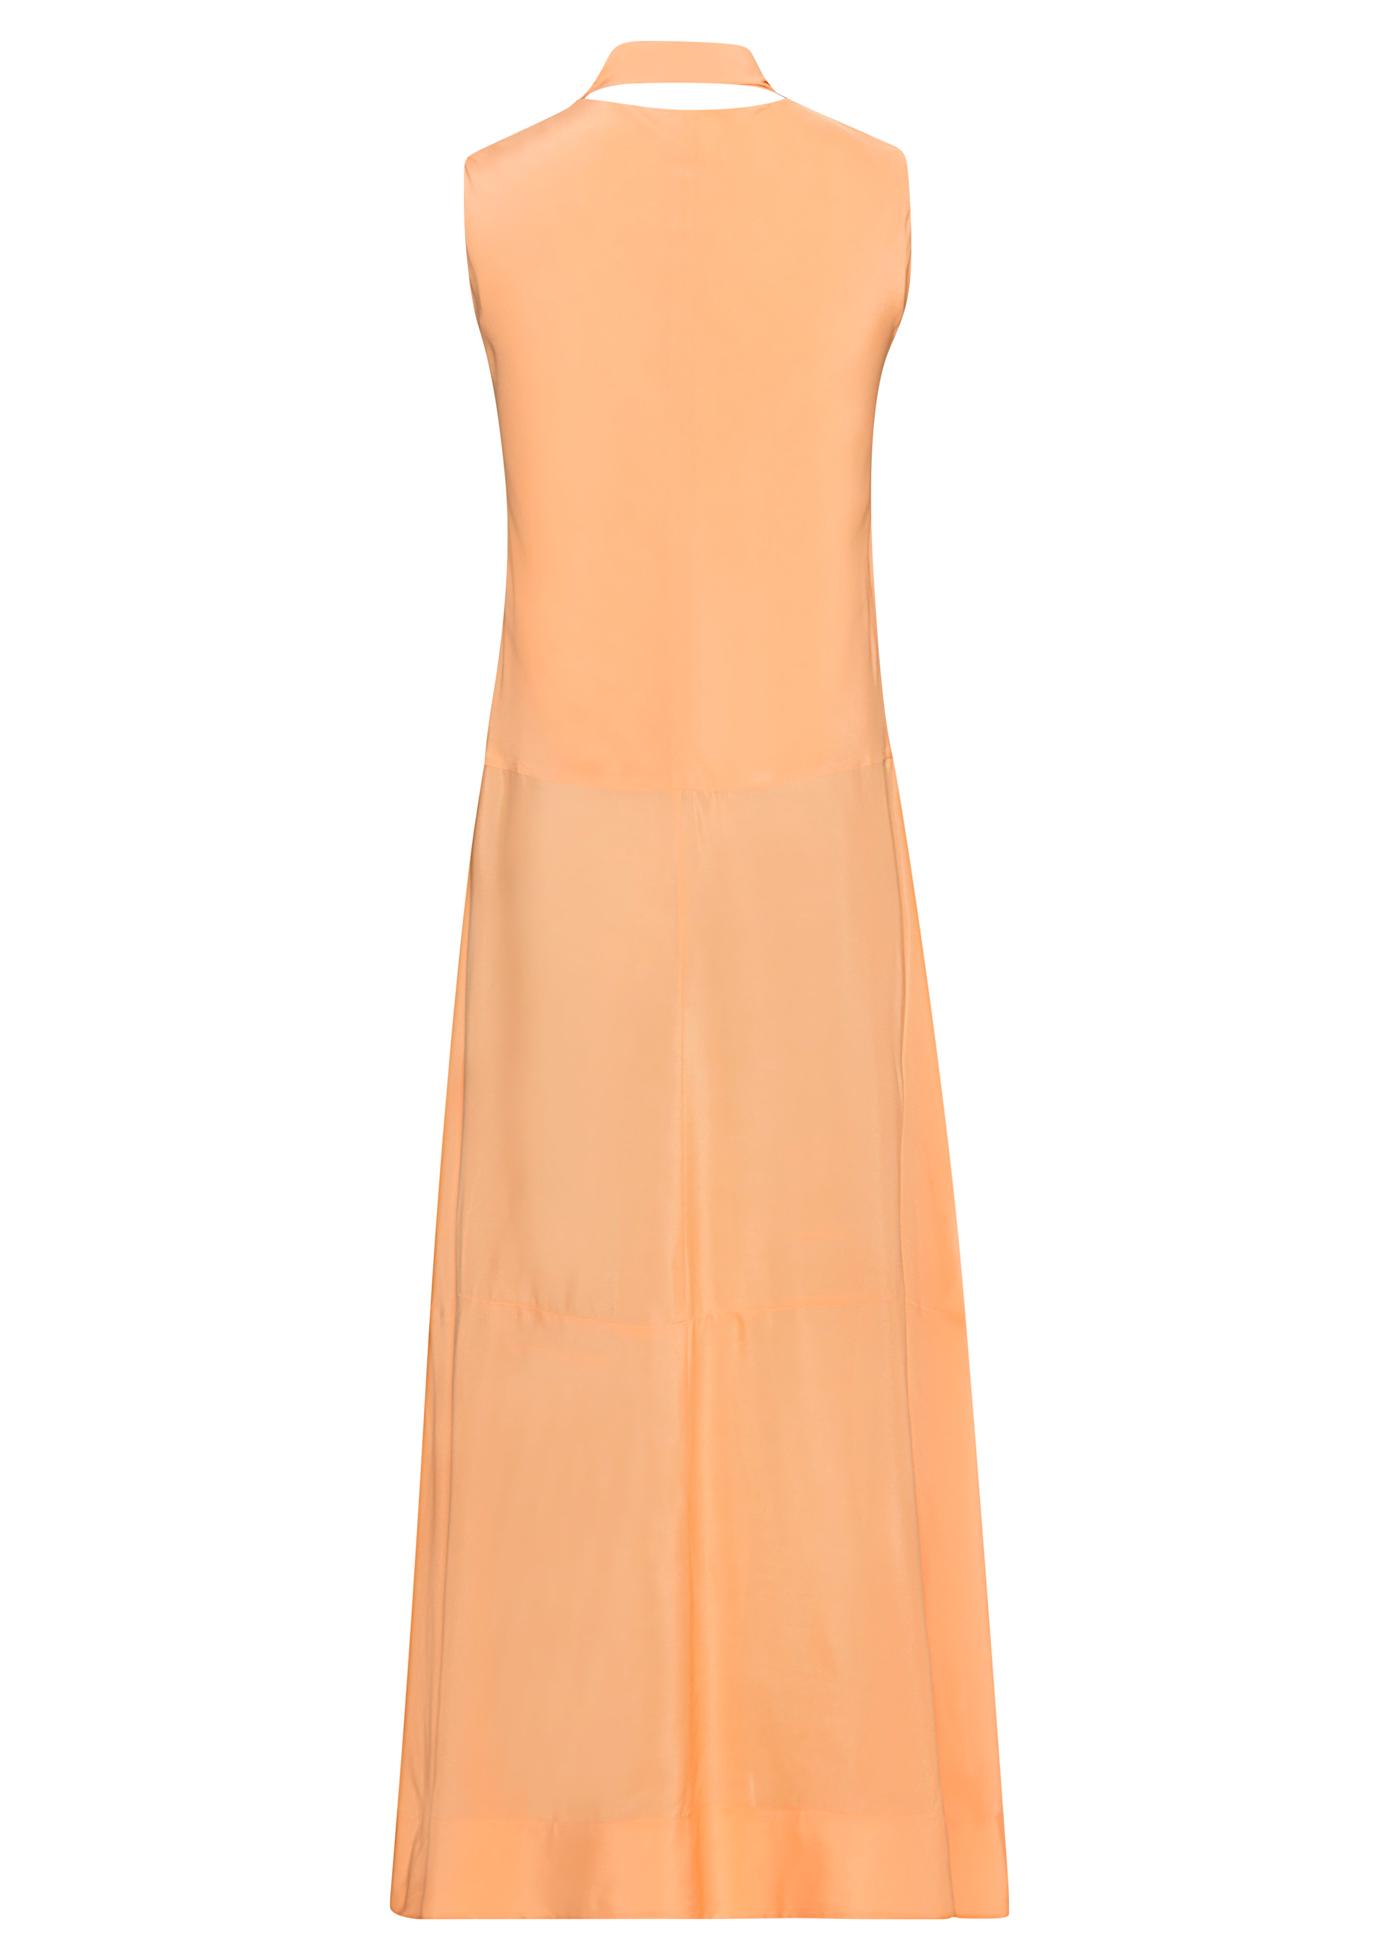 Sleeveless Silk Cdc Midi Dress image number 1